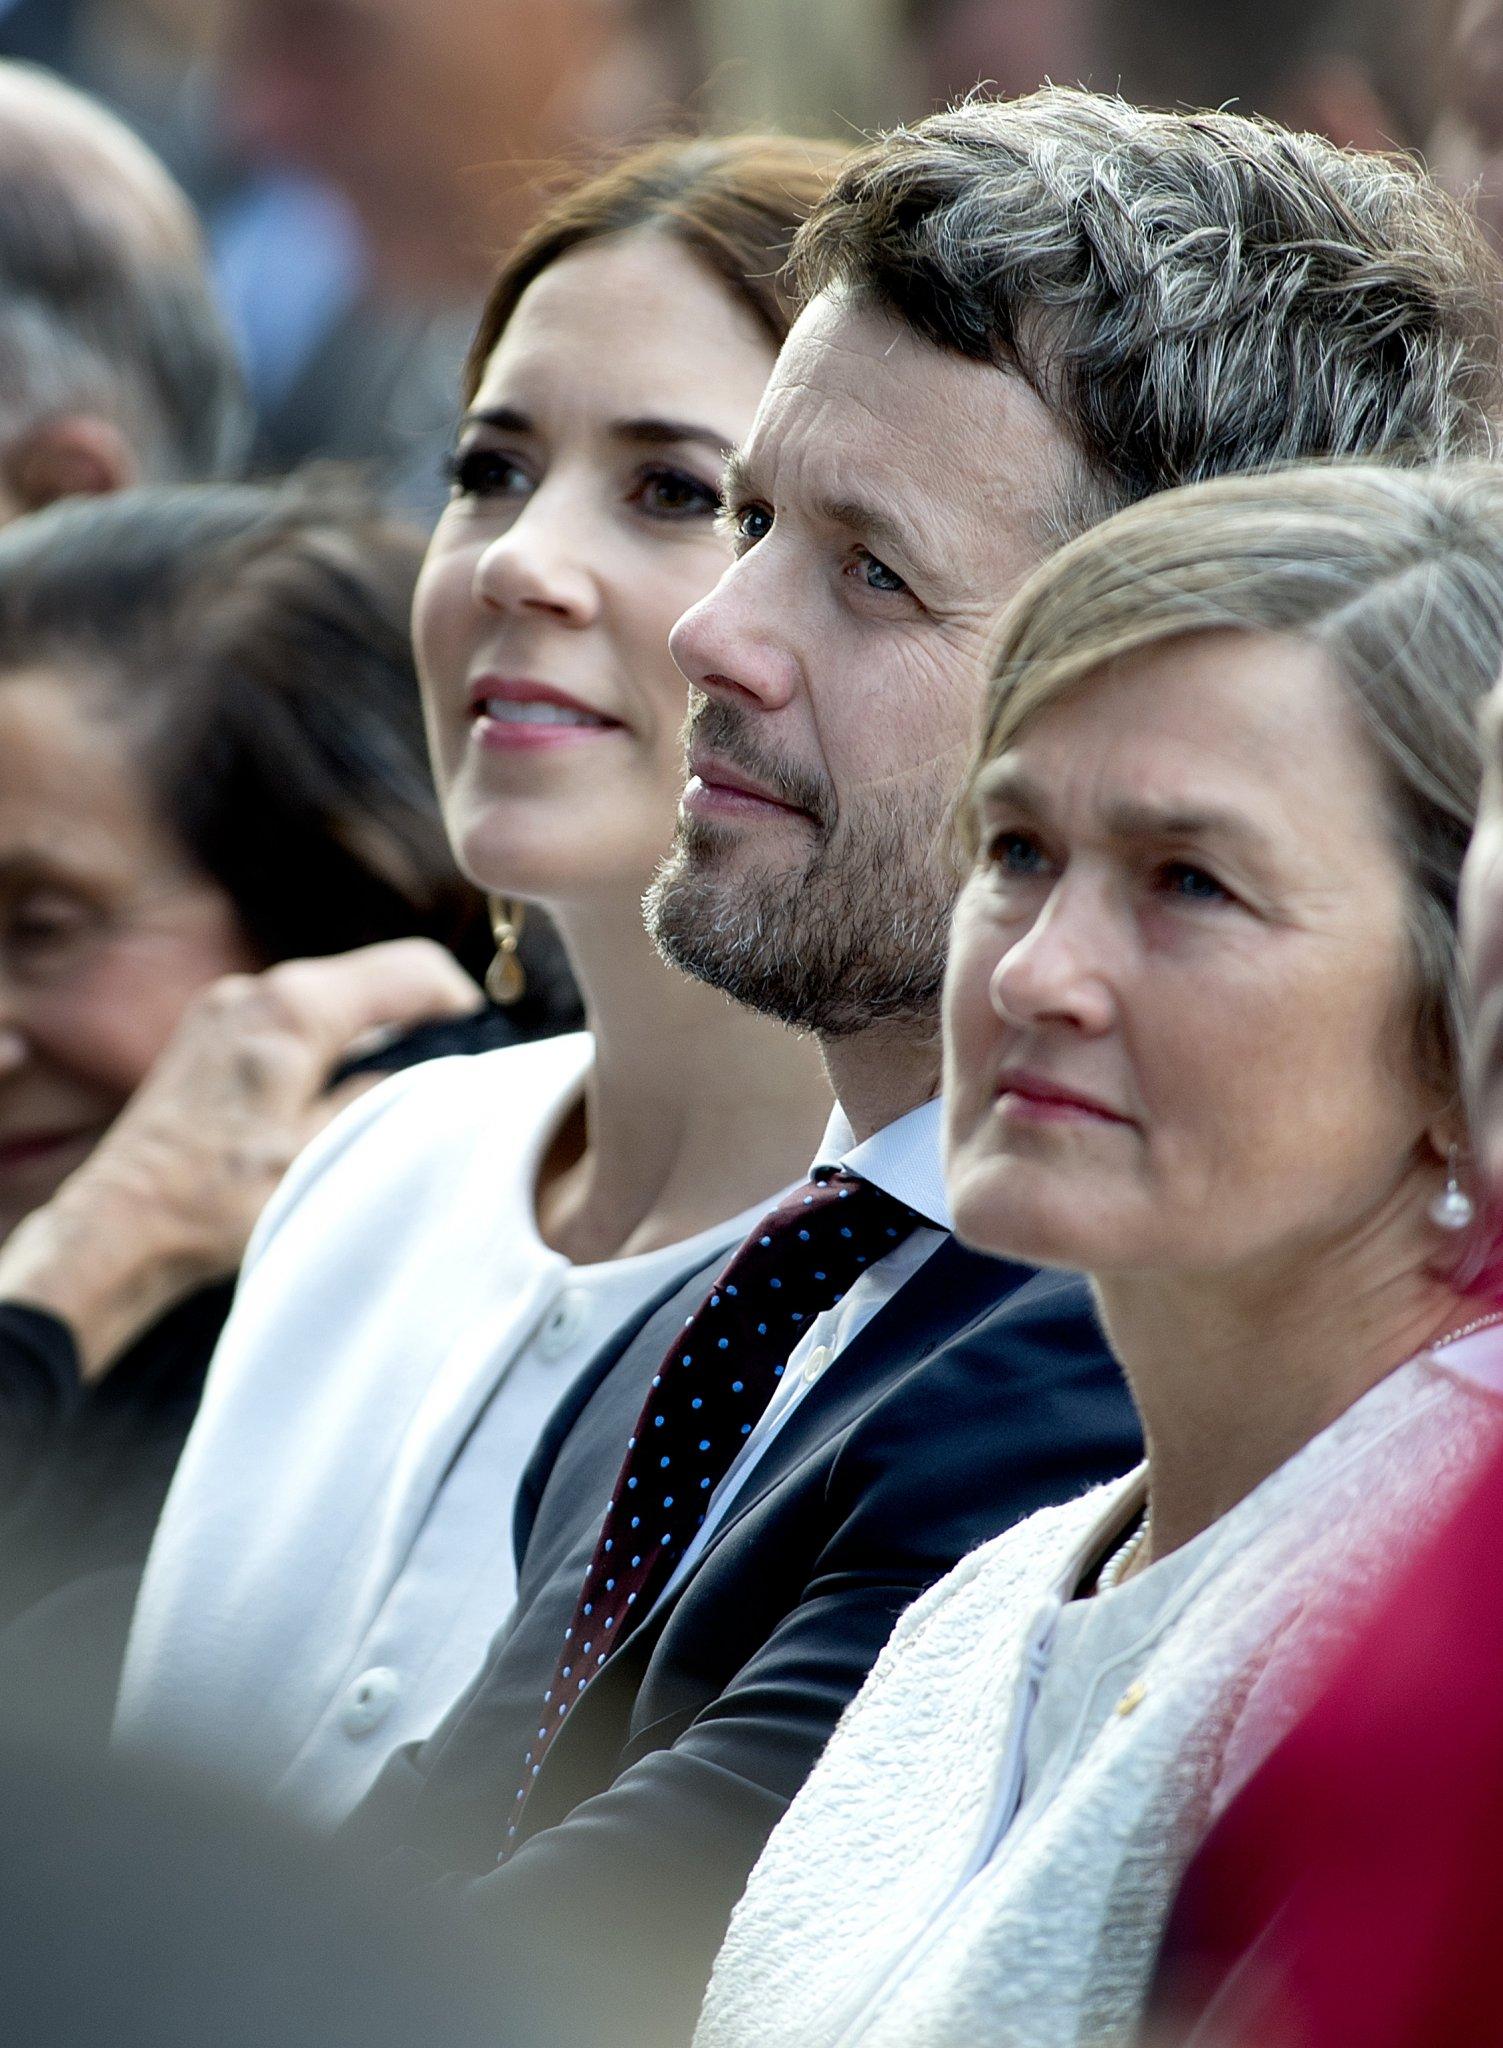 Mary y Frederik - Página 21 6924393-frederik-og-mary-fejrer-operahusets-40-rs-jubilum